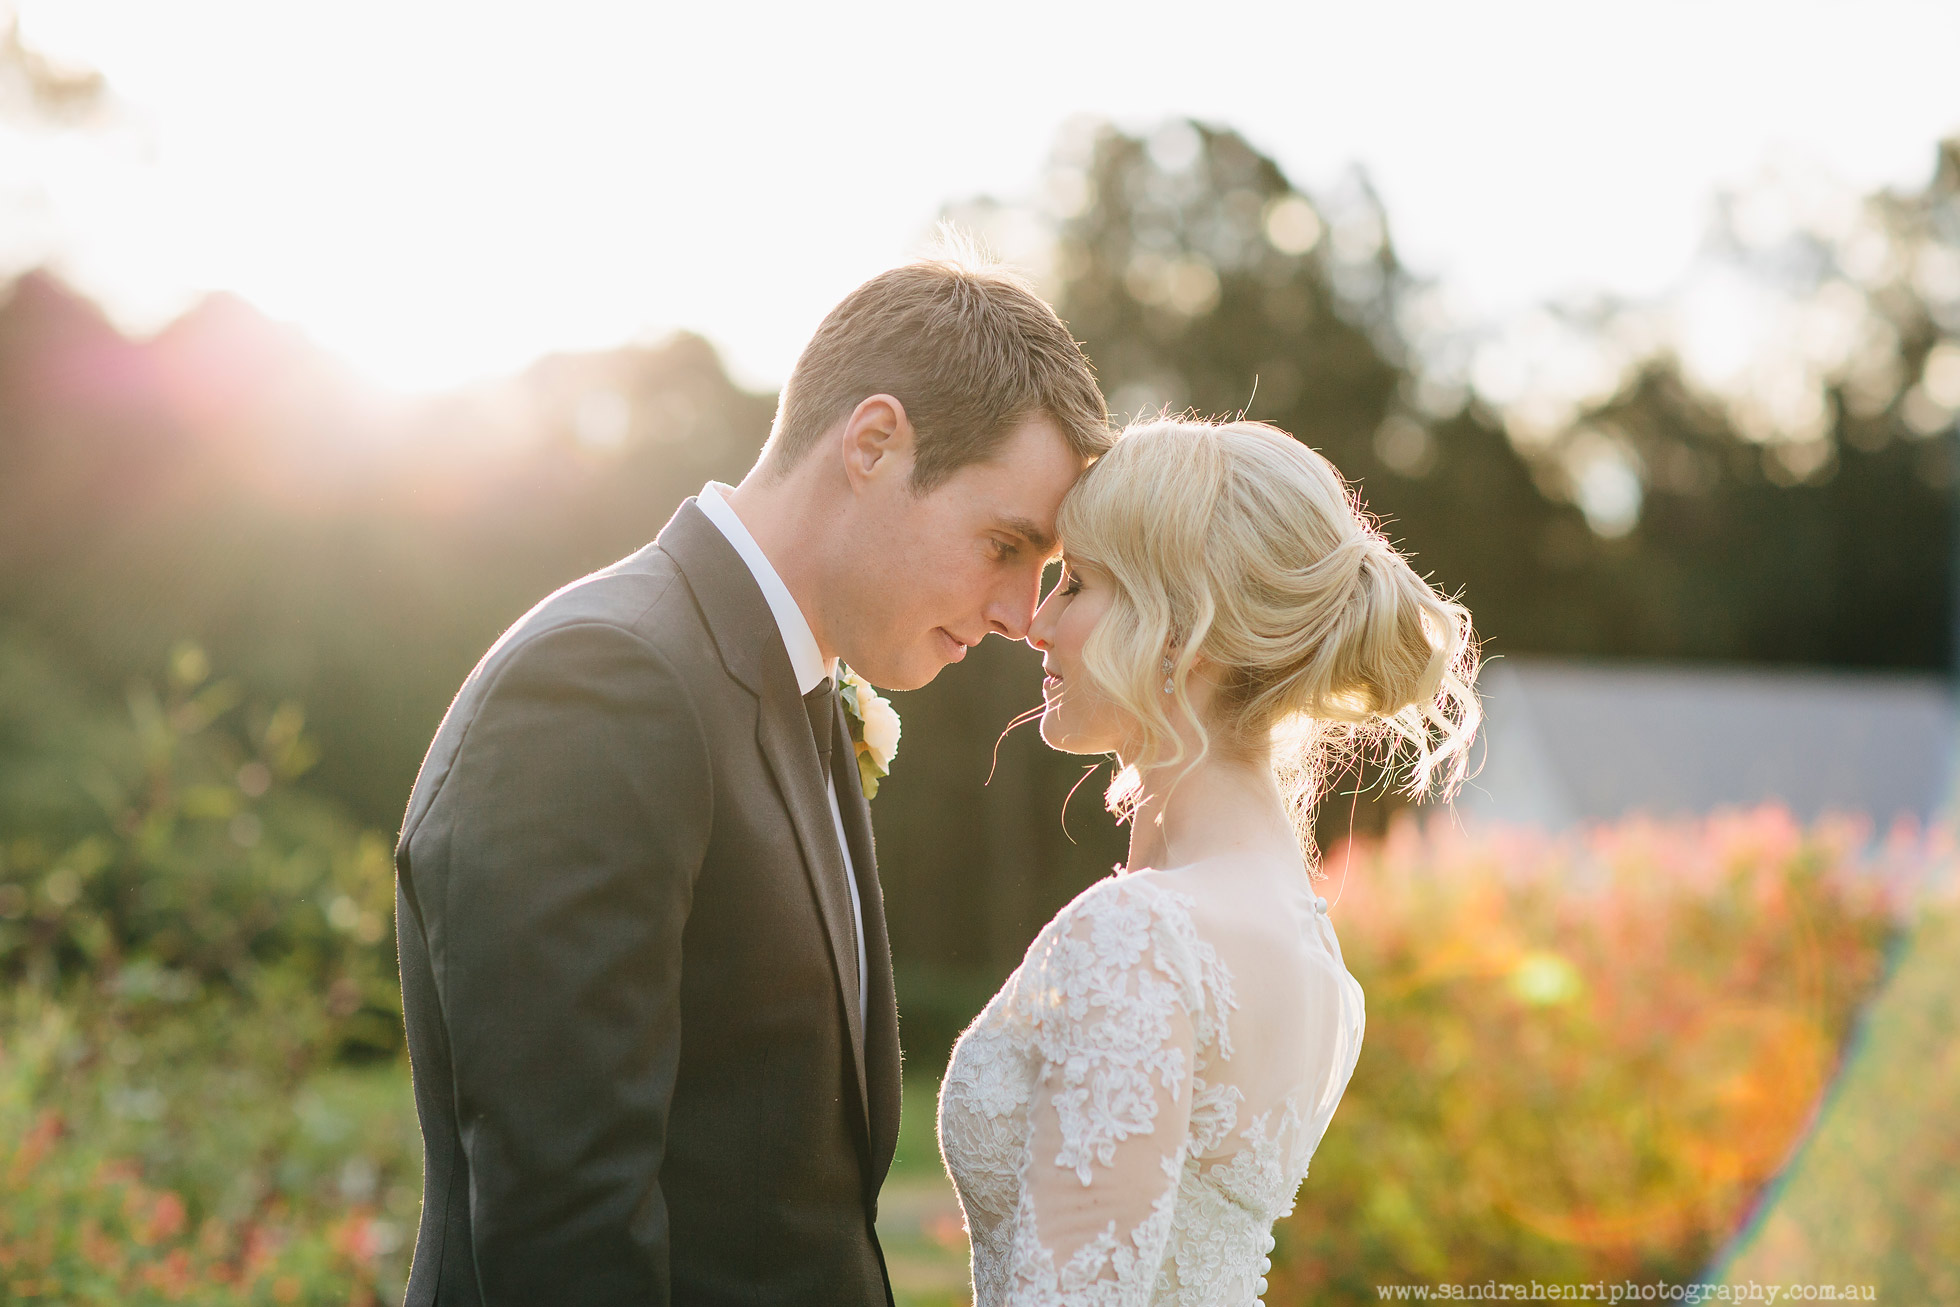 Roberts-Restaurant-garden-wedding-images-26.jpg